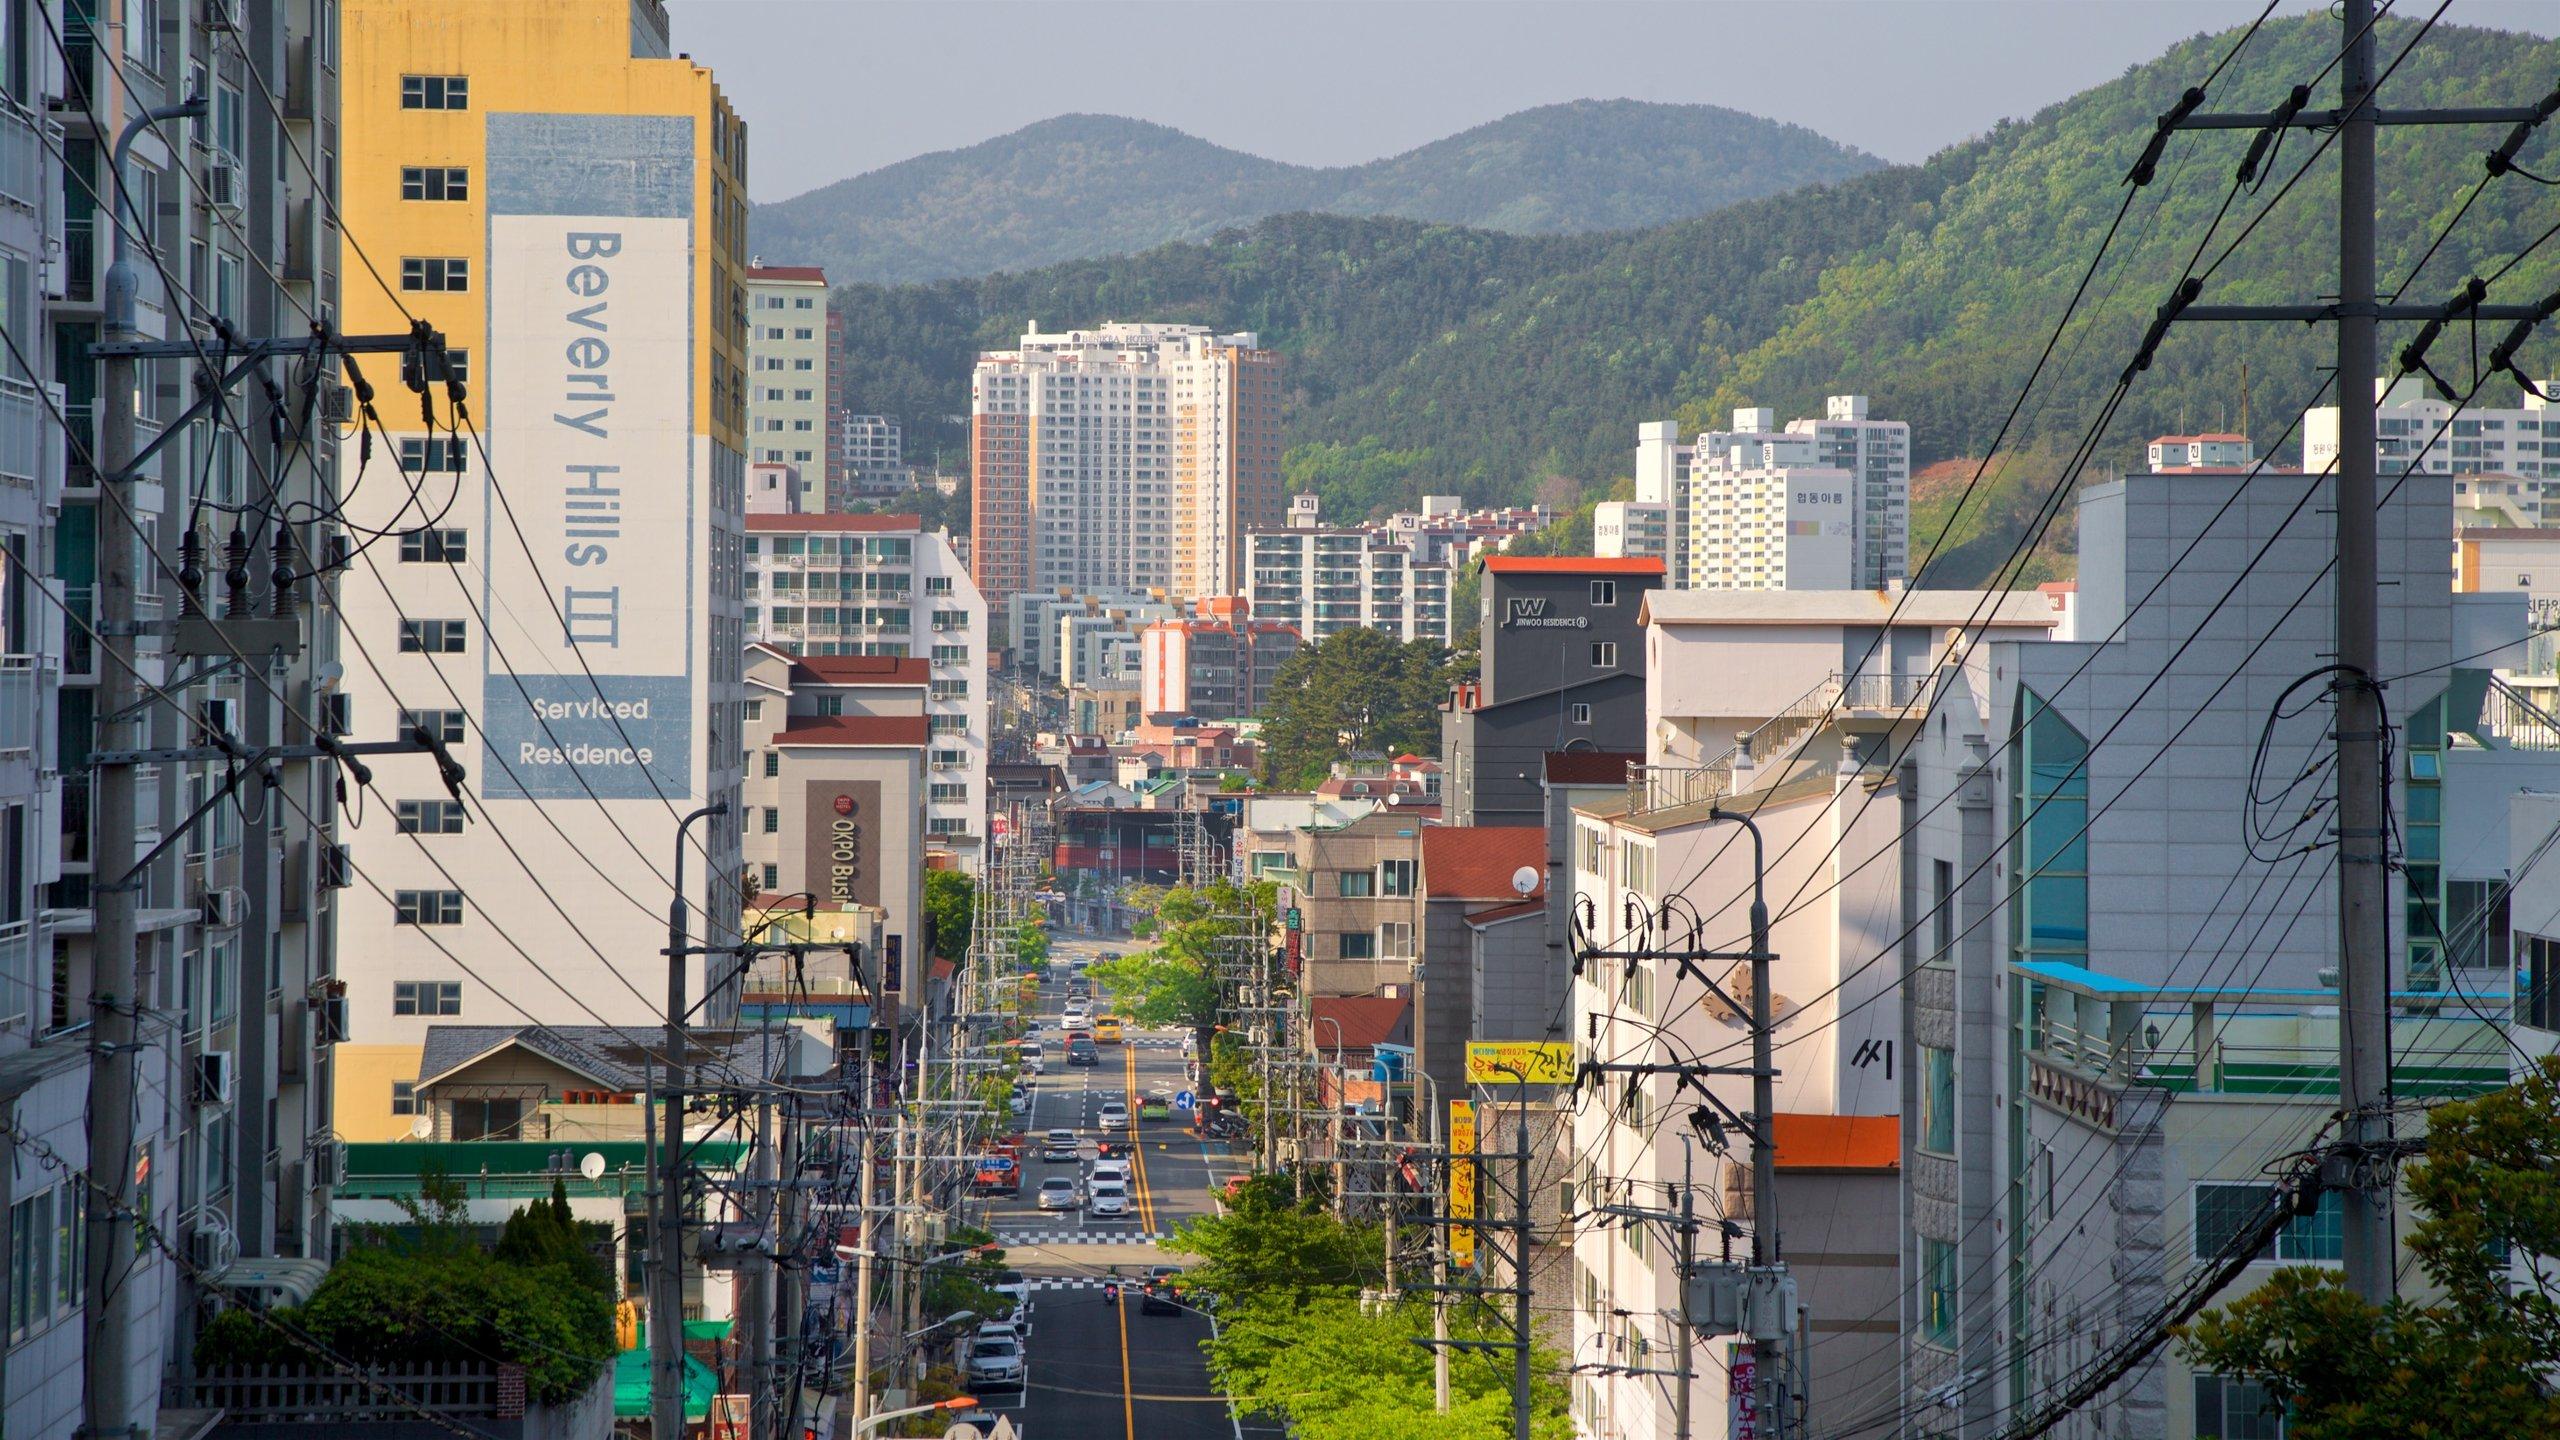 Geoje, South Gyeongsang, South Korea